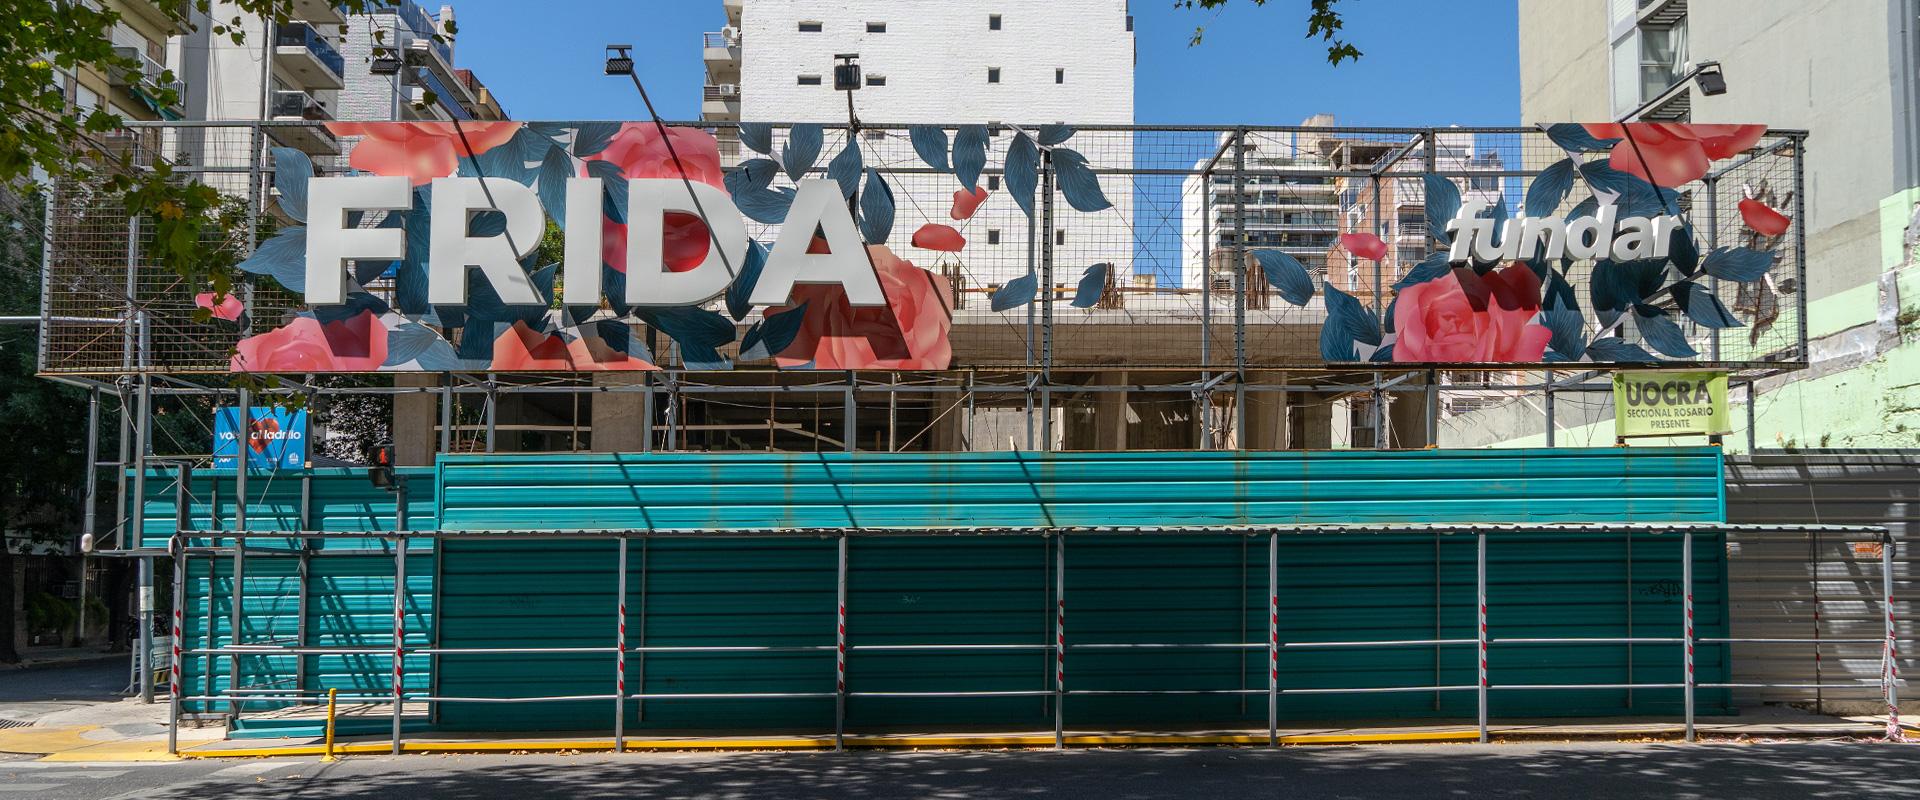 Frida - Enero 2021 Avance de Obra